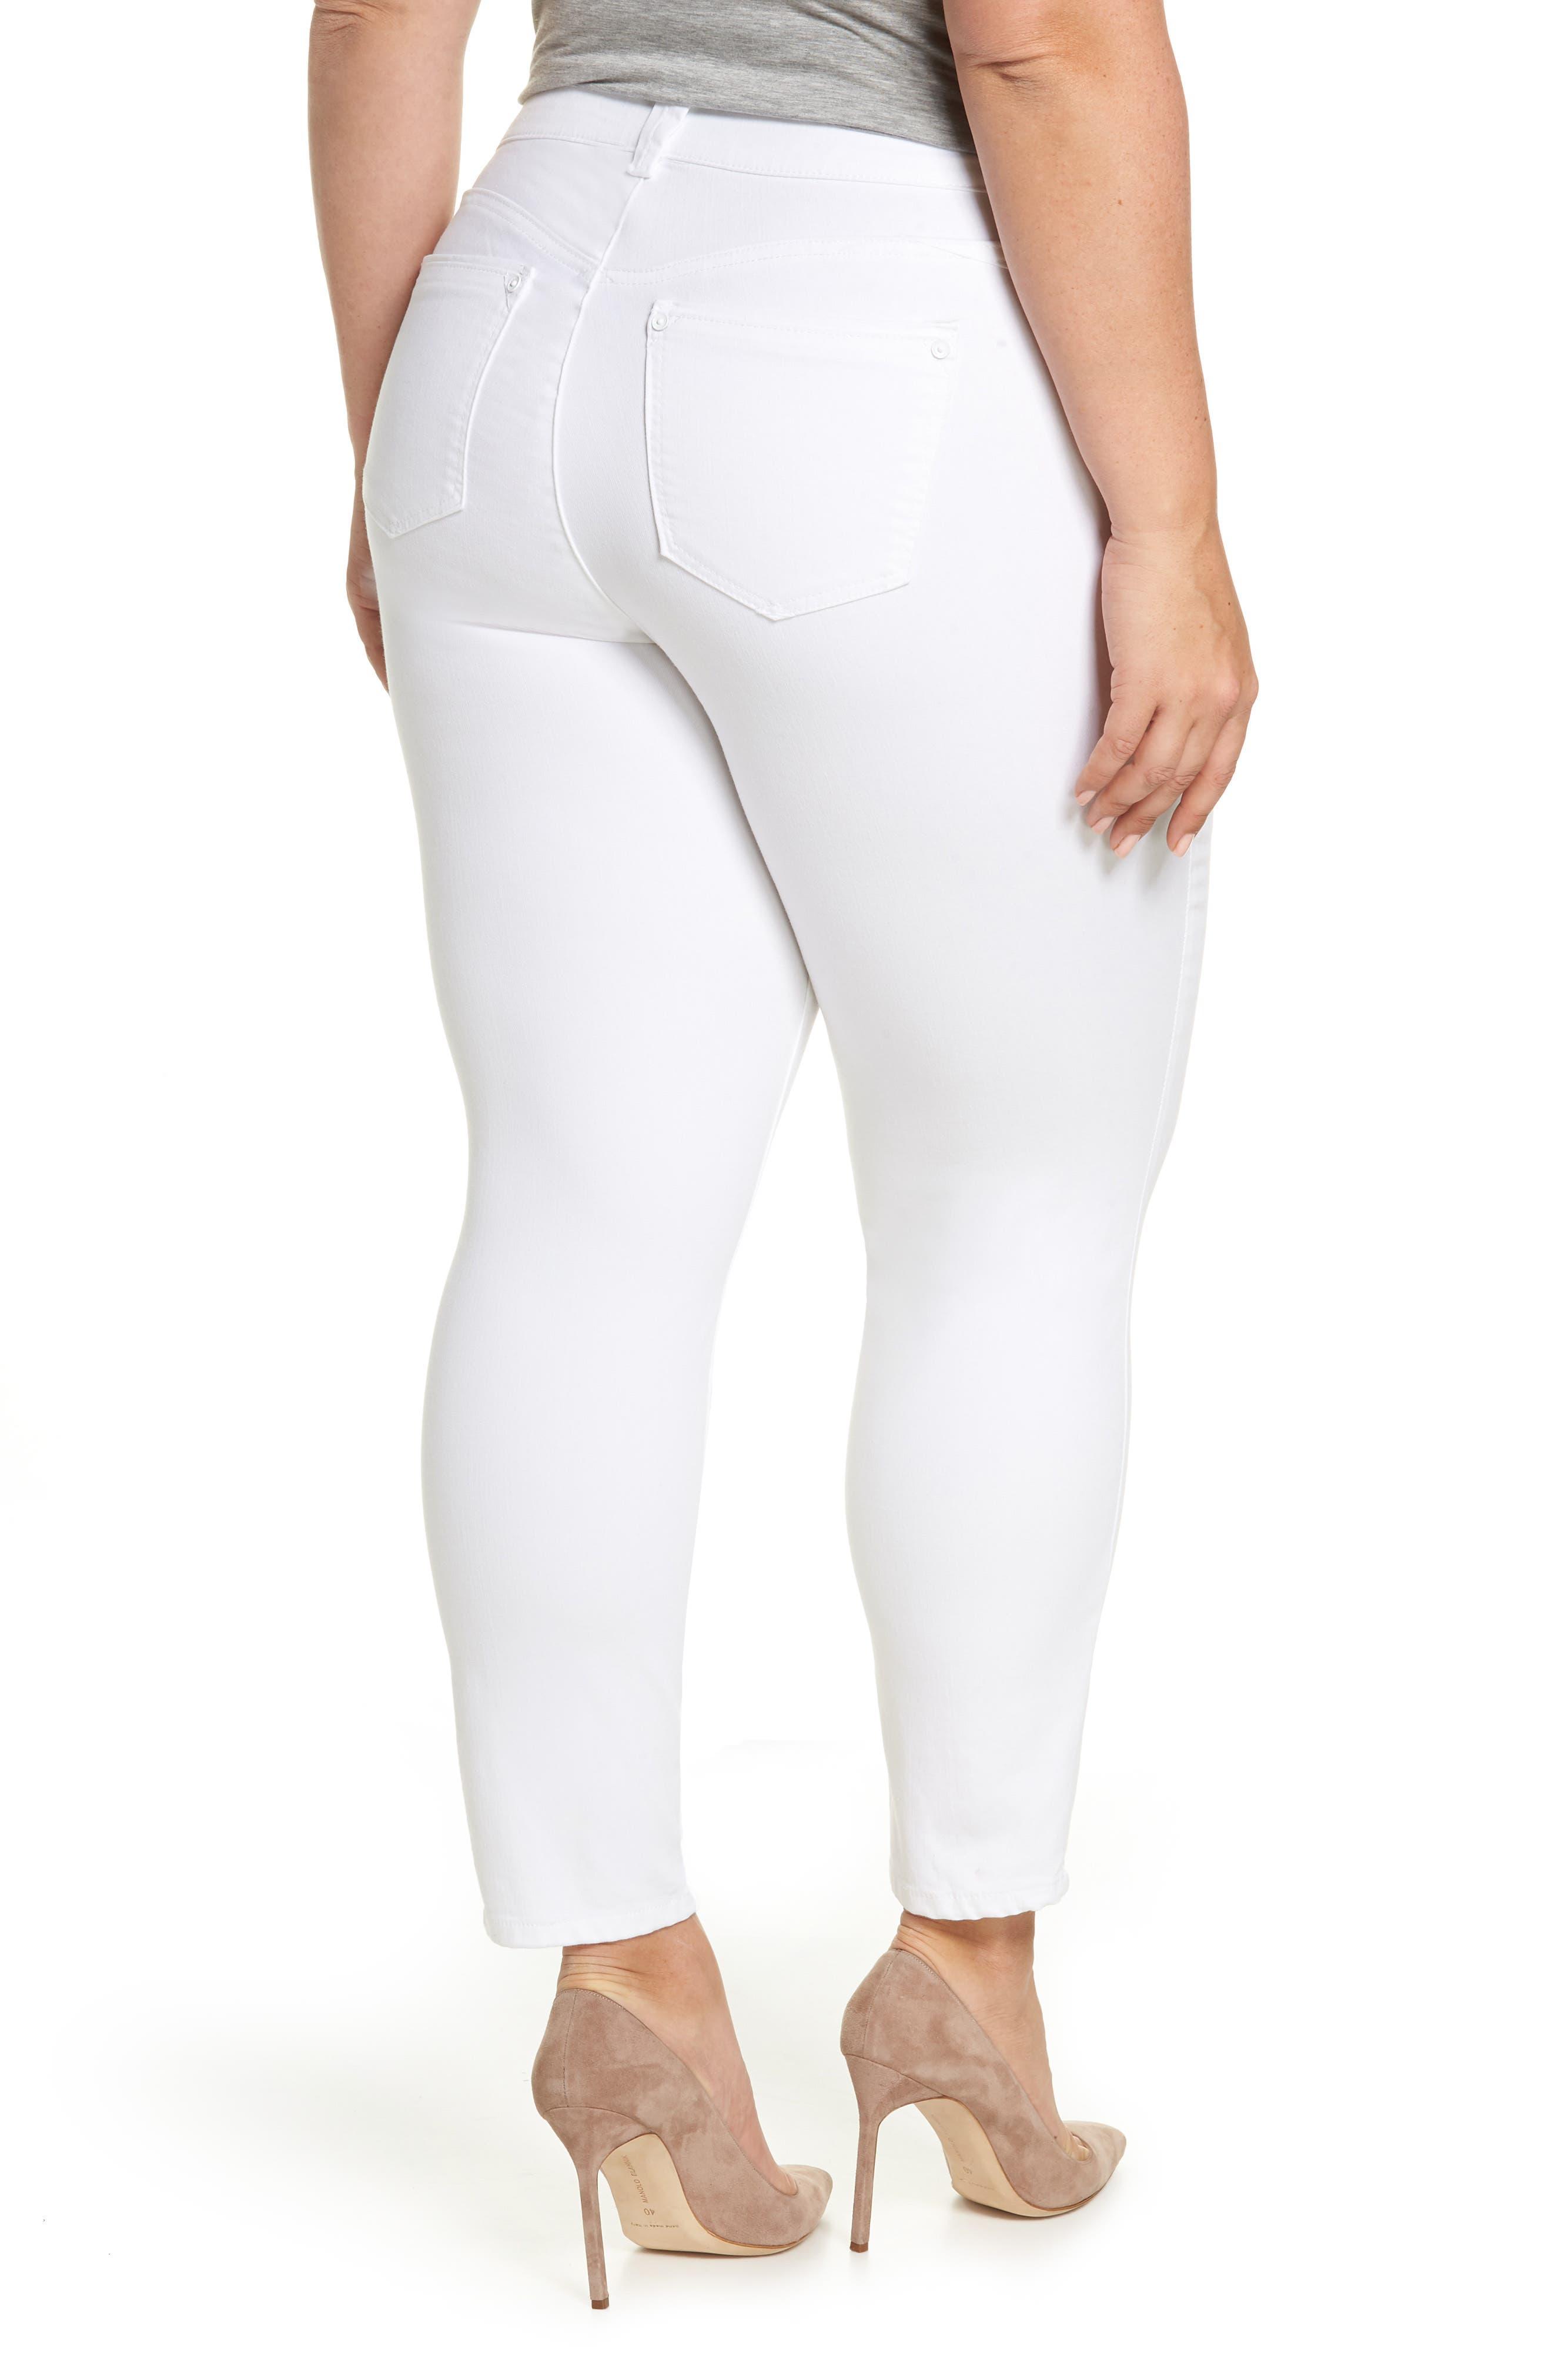 Ab-solution Ankle Skimmer Jeans,                             Alternate thumbnail 2, color,                             Optic White